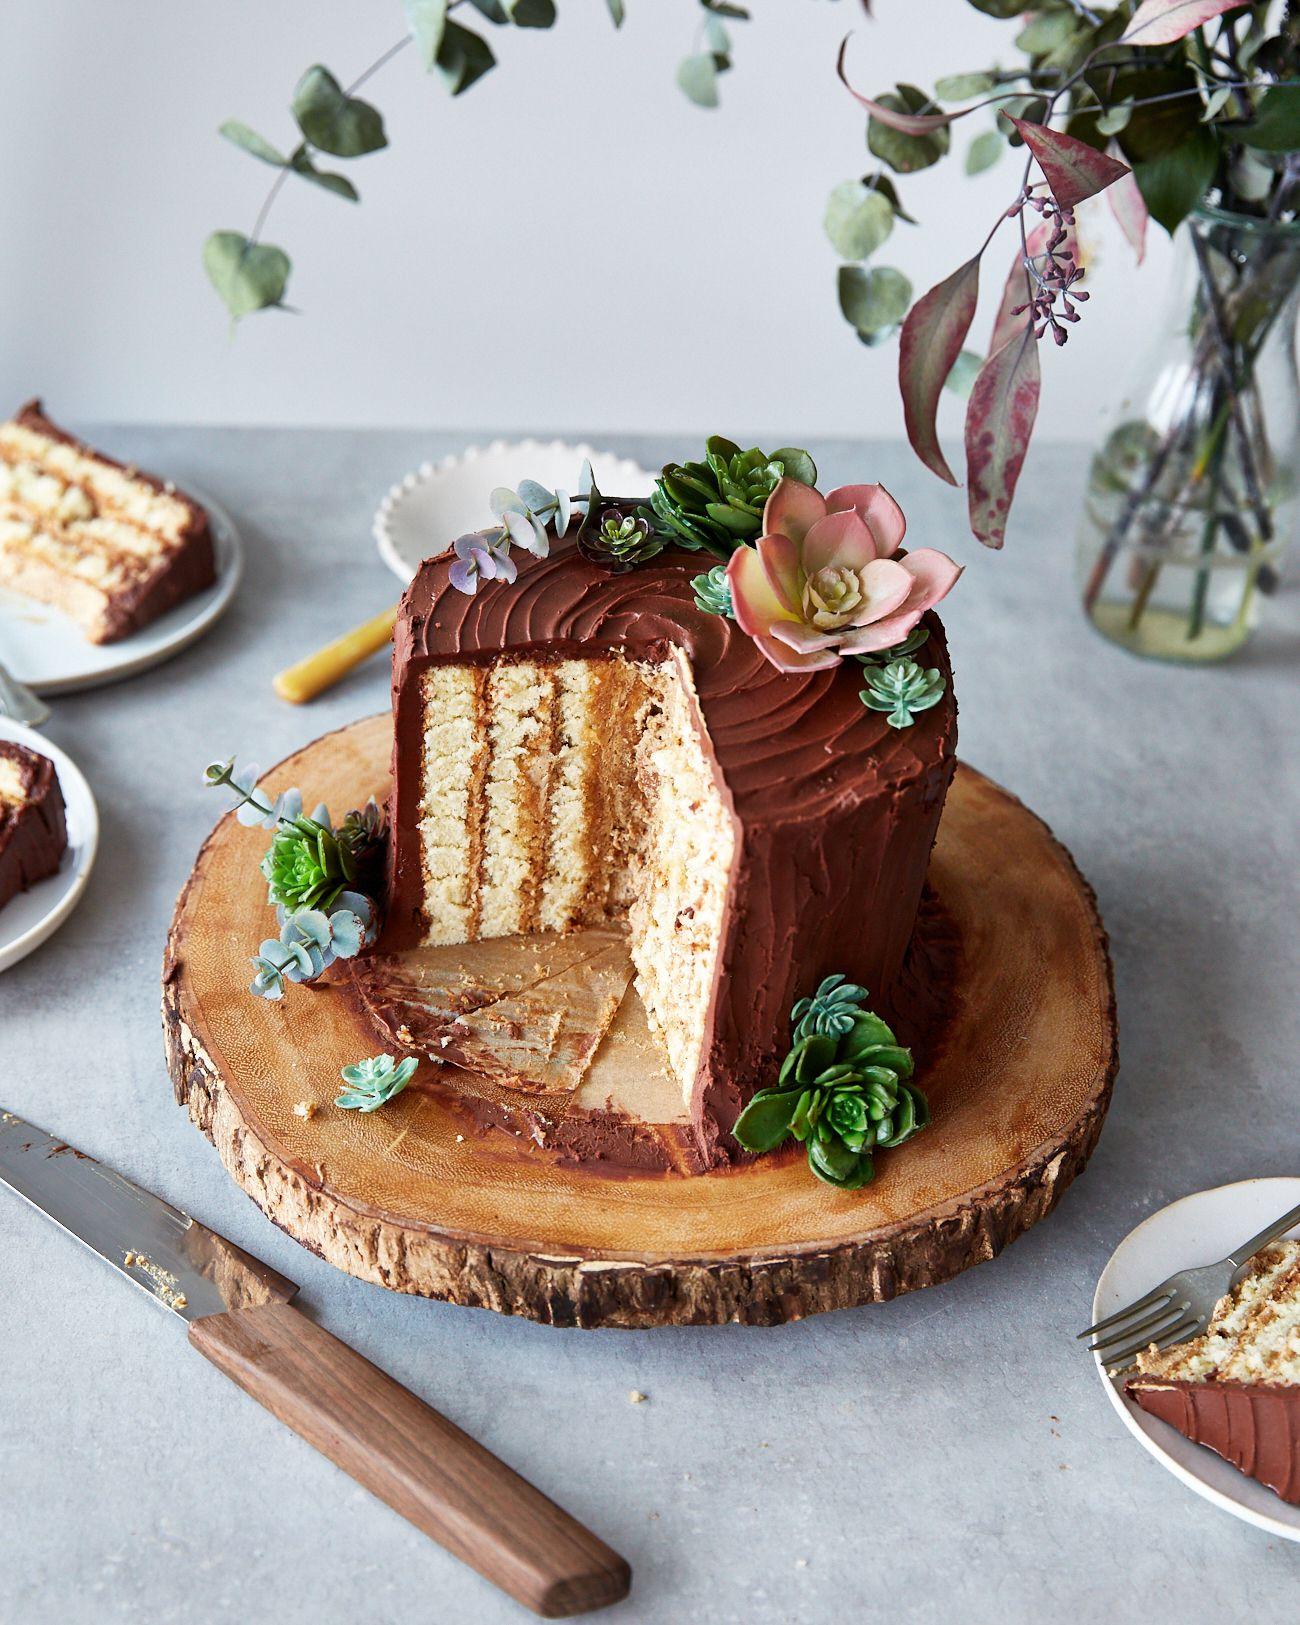 Vertically Layered Chocolate Yule Log Recipe Tree